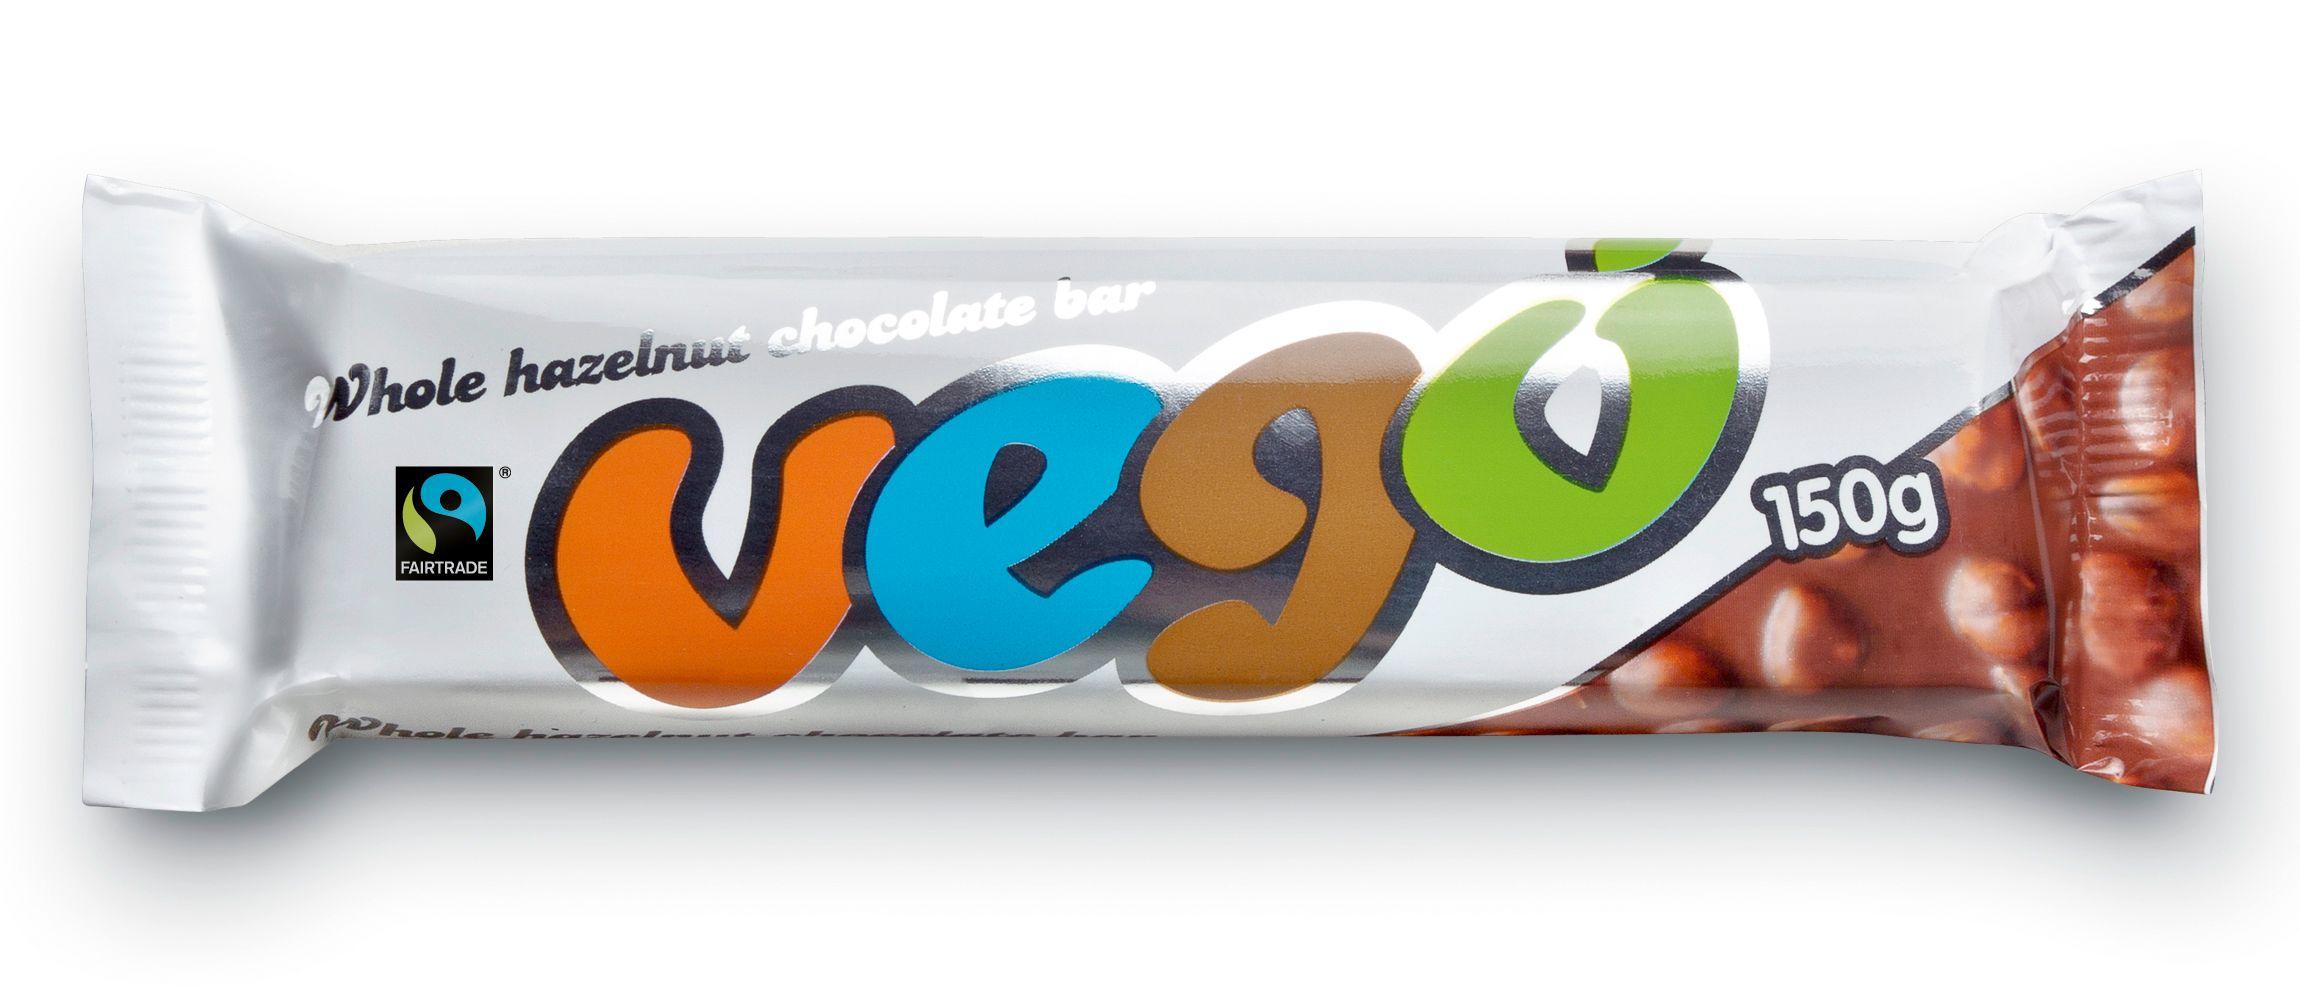 Image result for vegan chocolate bars